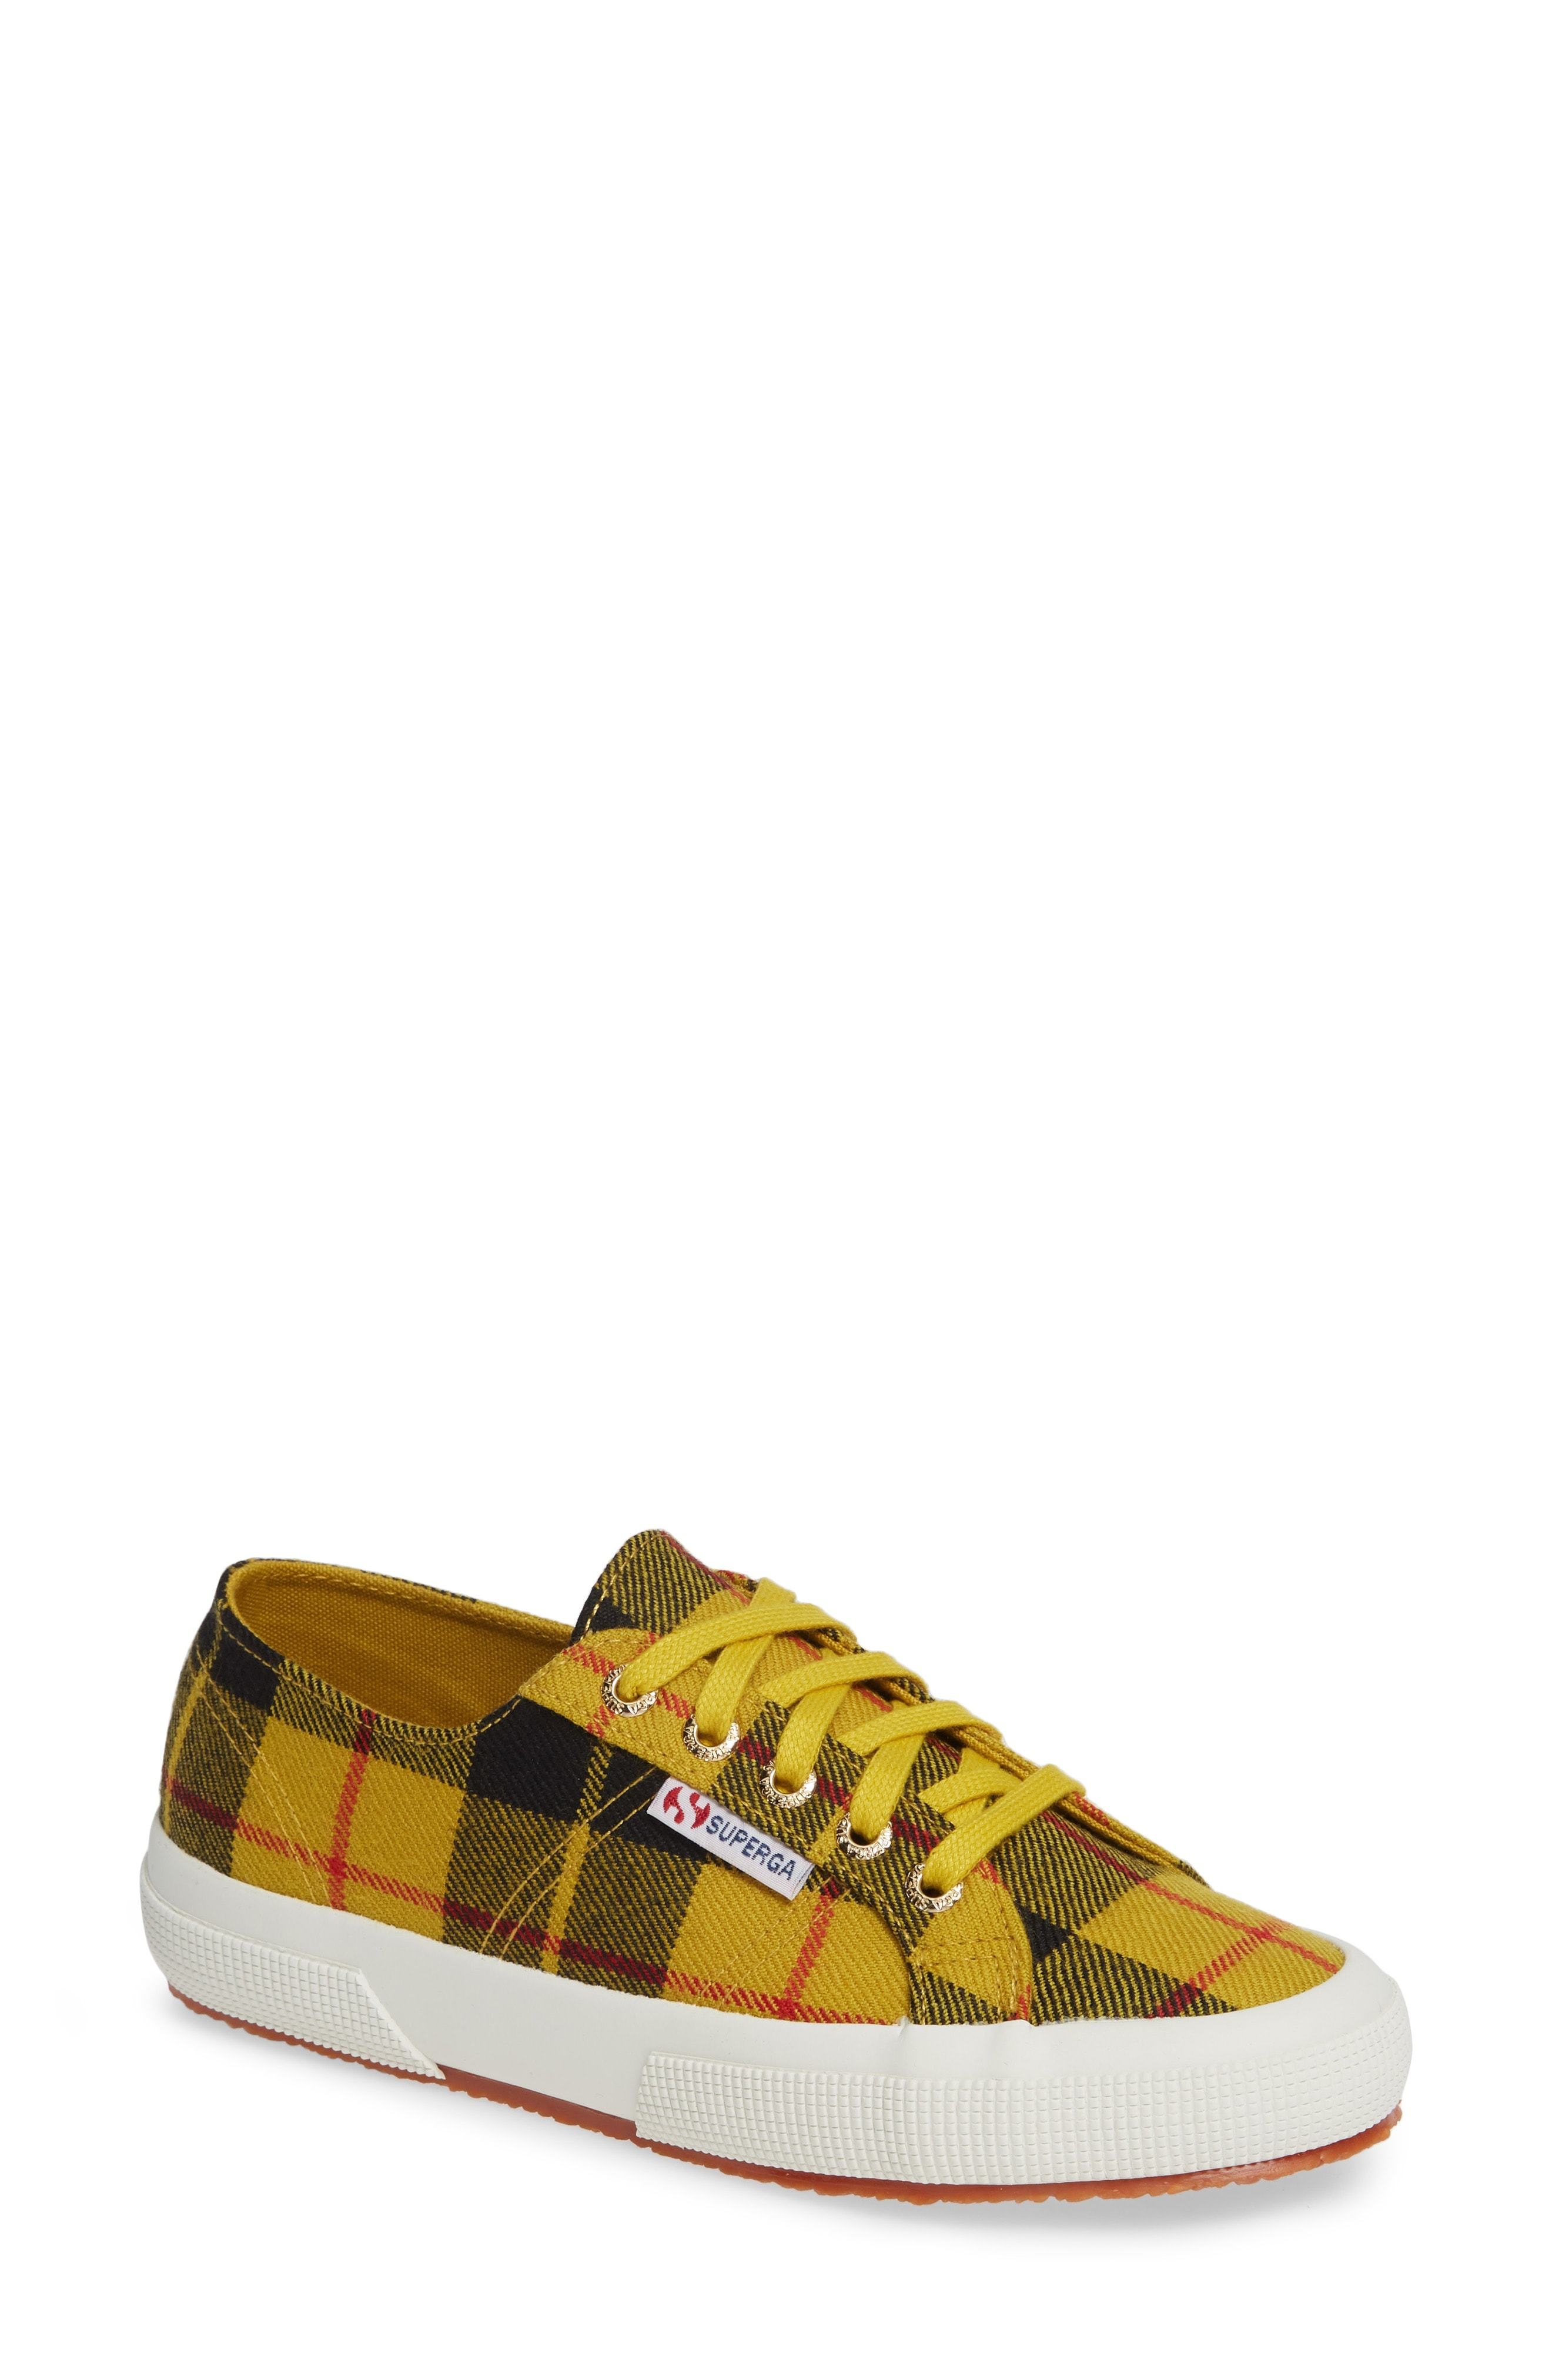 9c82cc2777fc ... Superga Tartan Print Sneaker